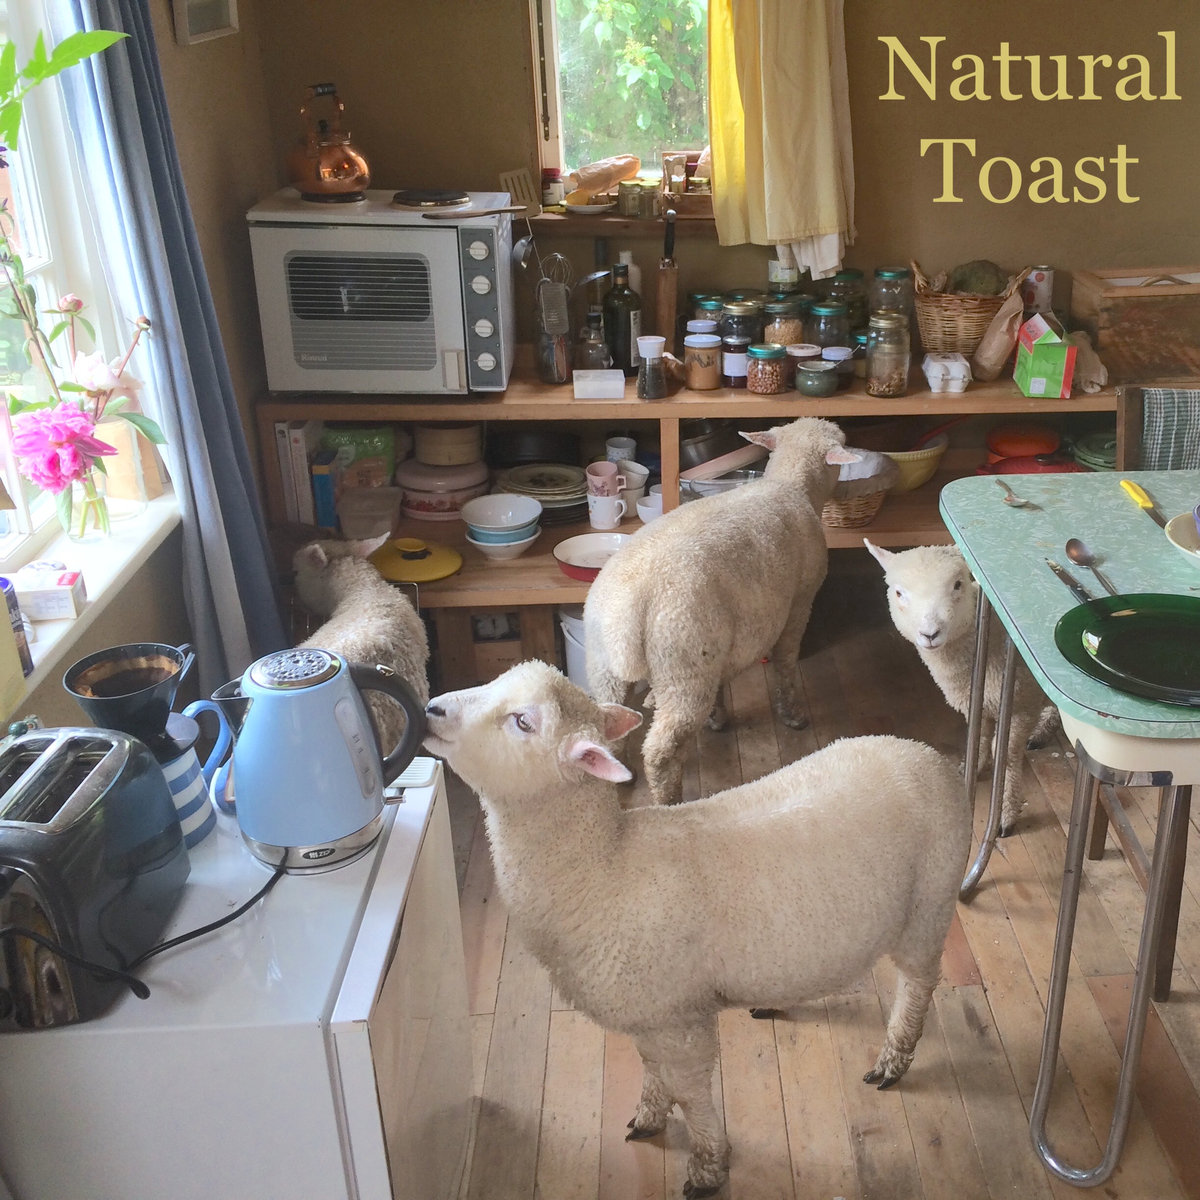 Natural Toast